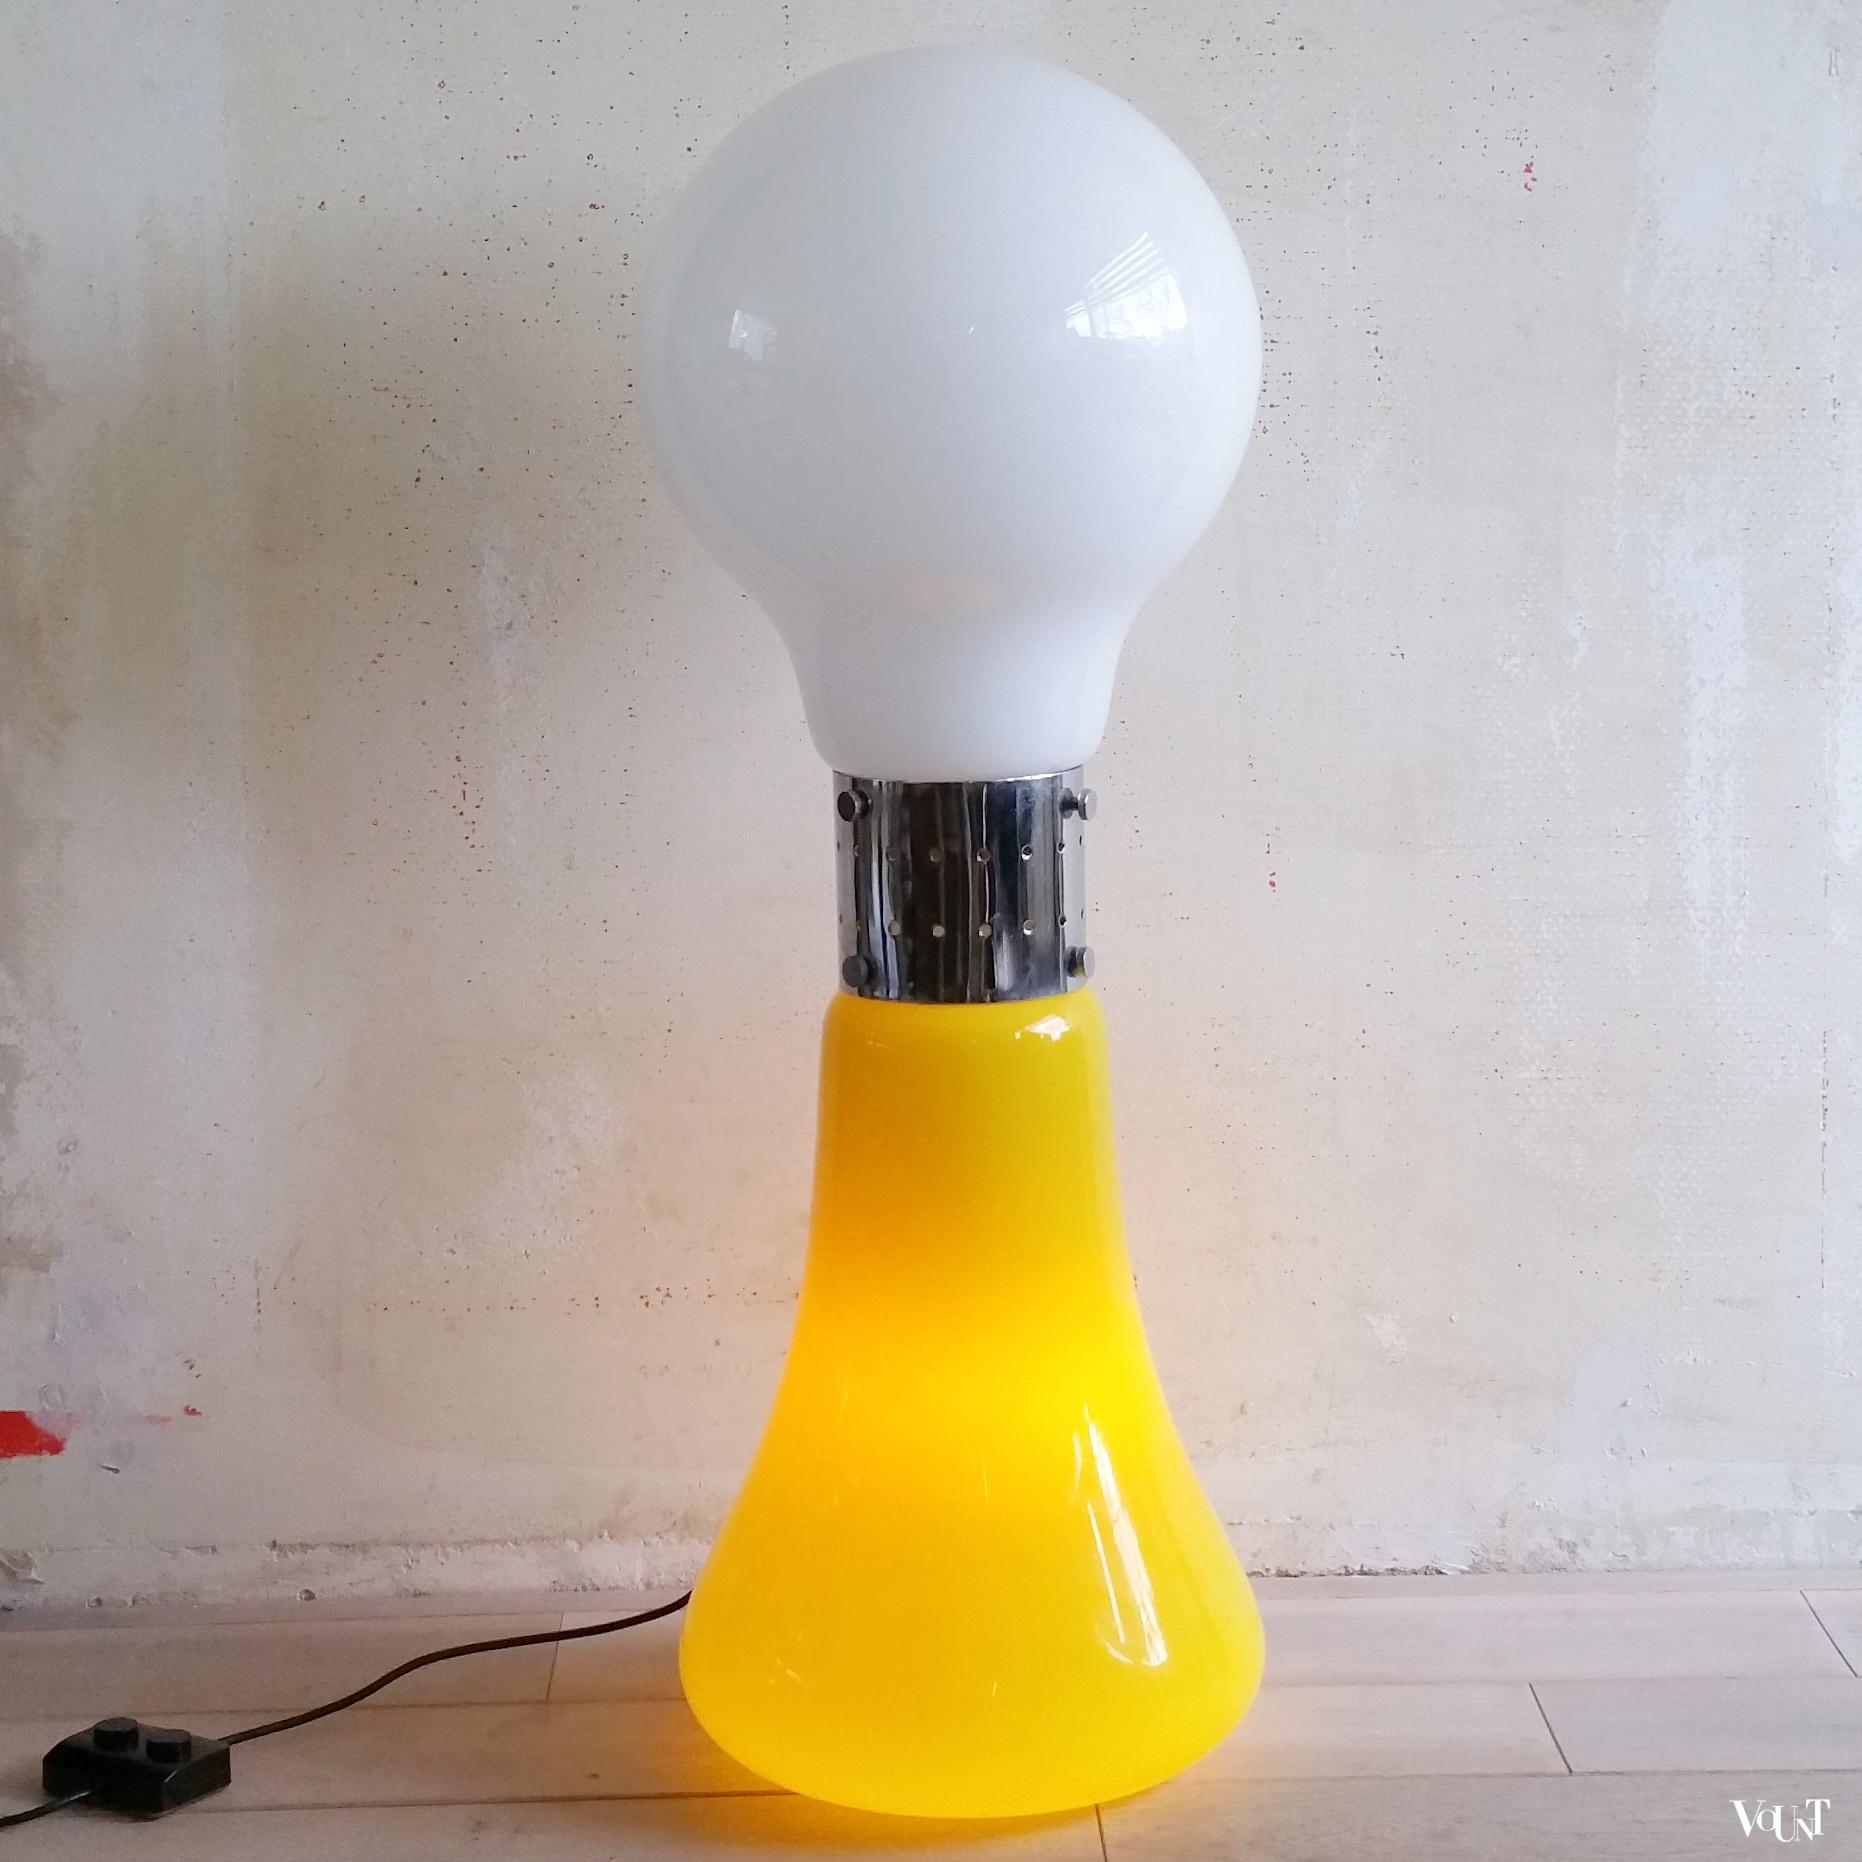 birillo vloerlamp wit en geel murano glas carlo nason. Black Bedroom Furniture Sets. Home Design Ideas